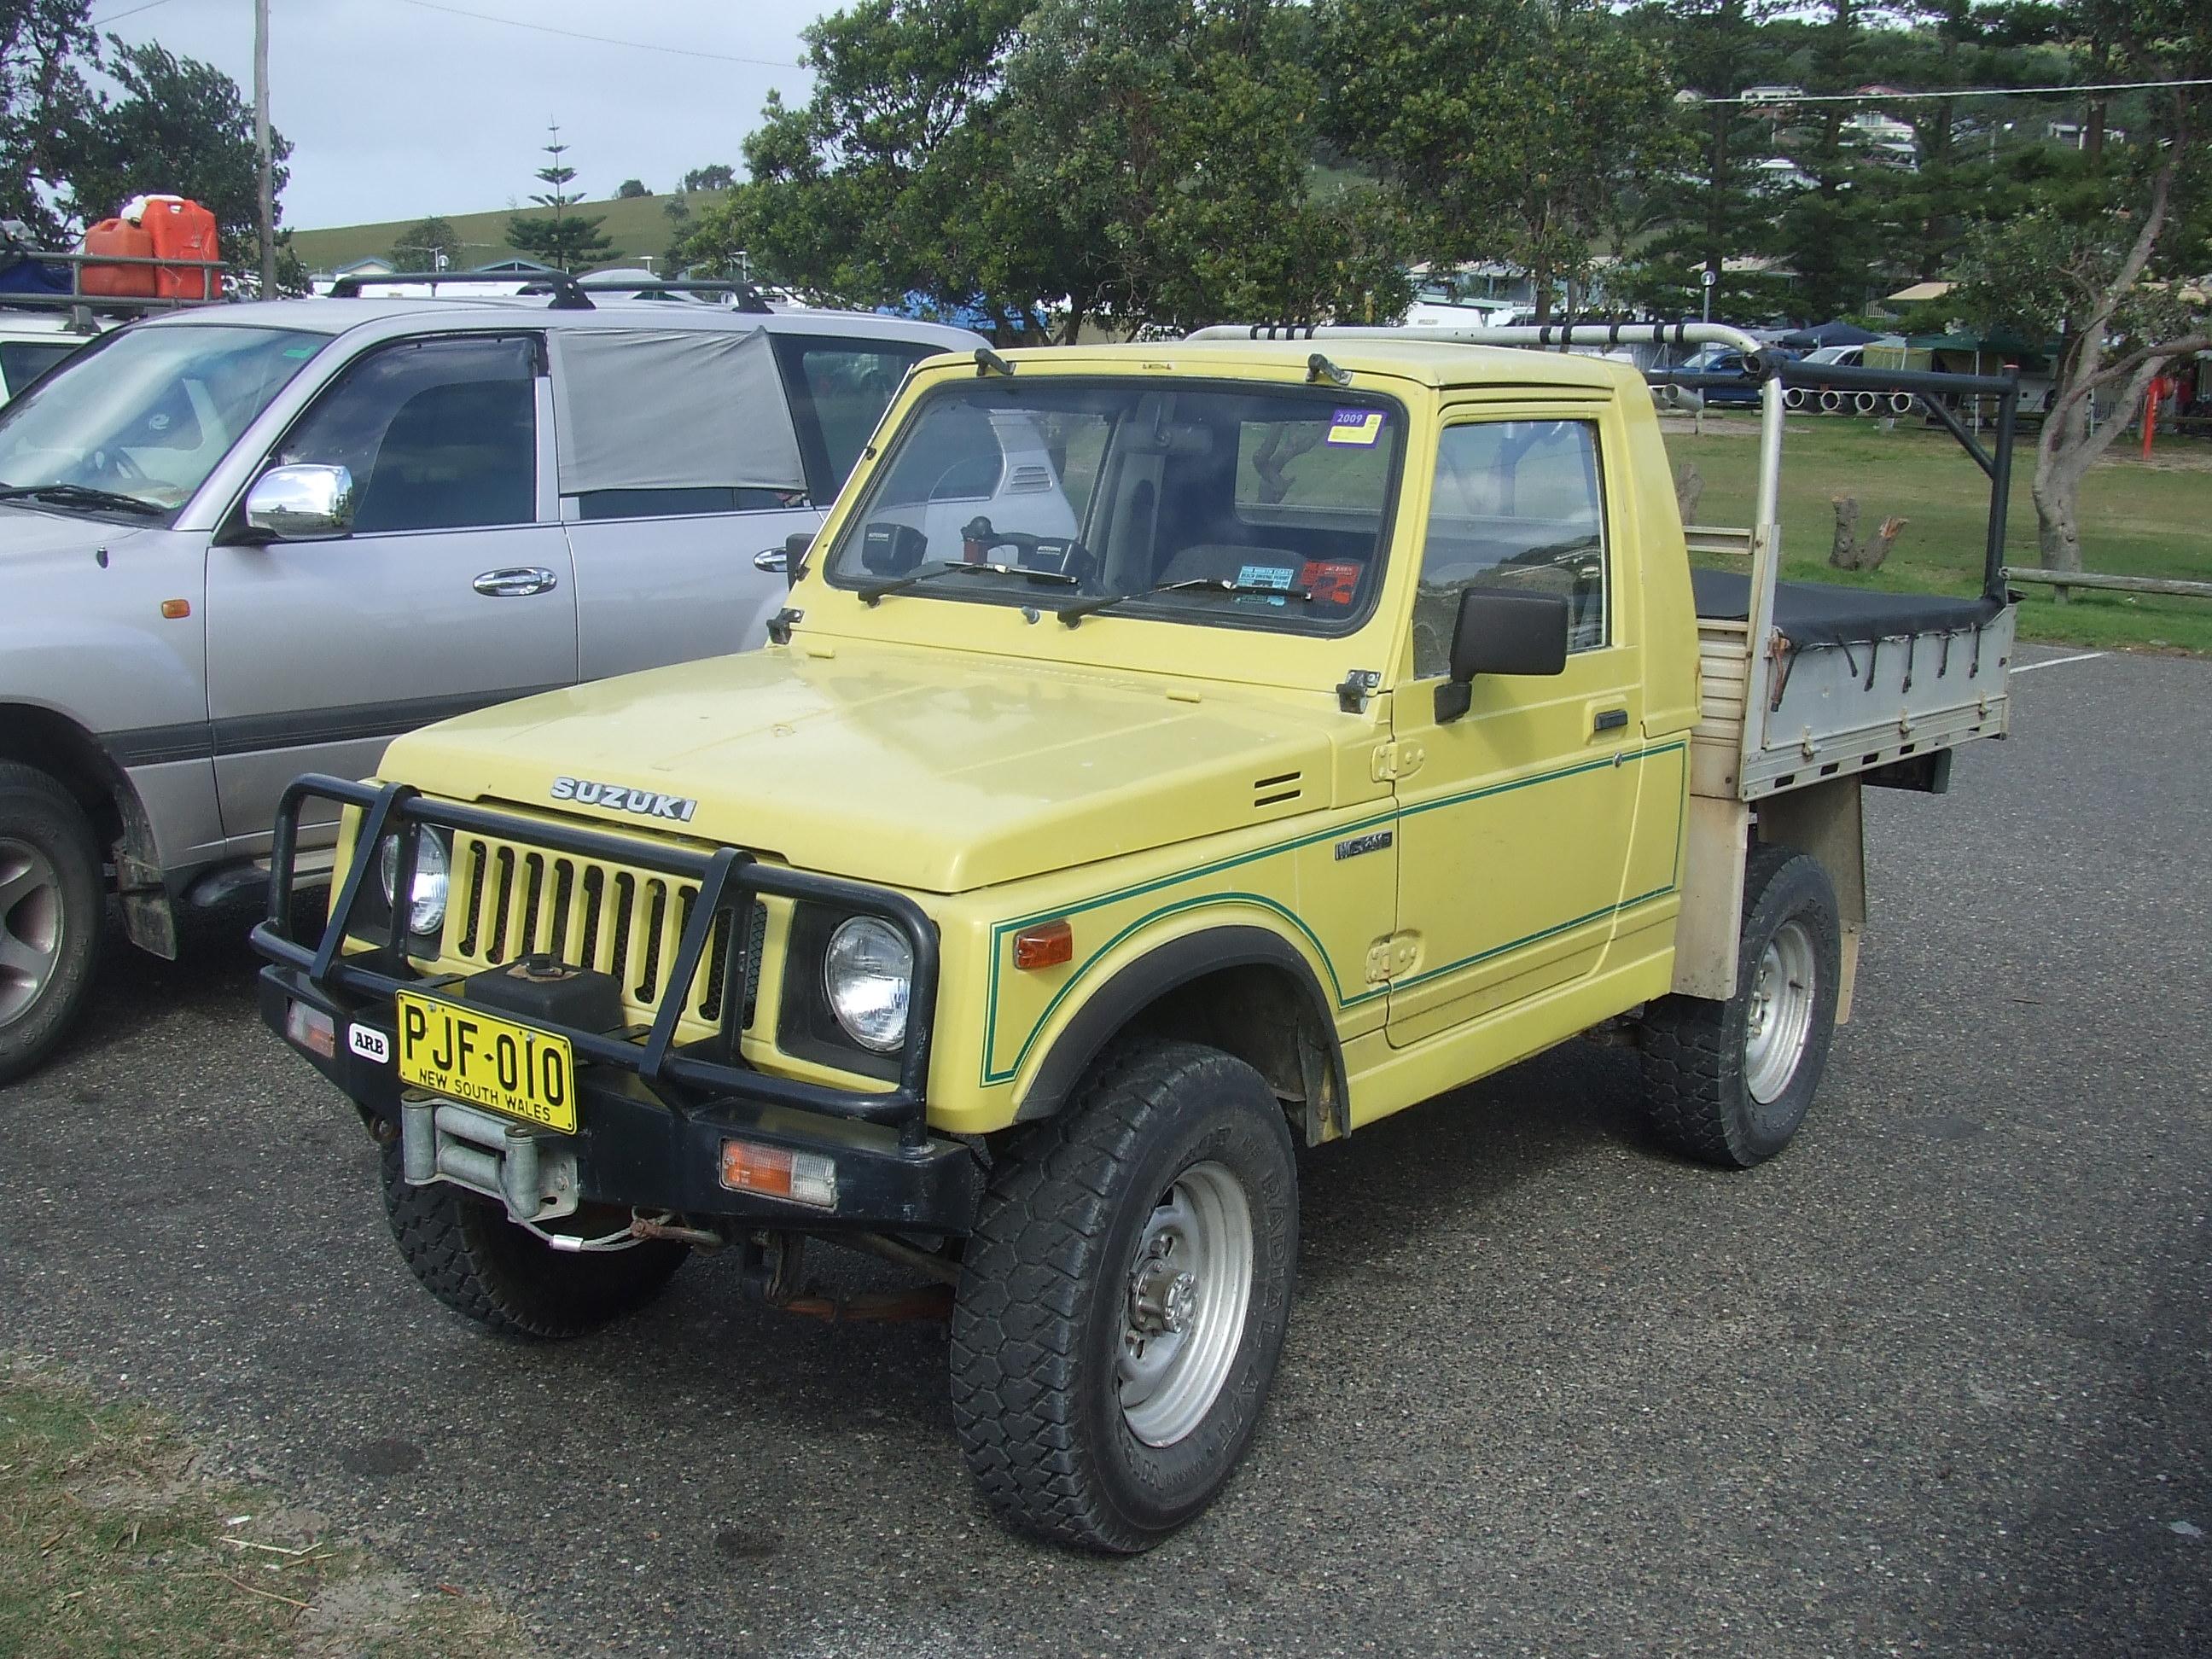 Does The Suzuki Burgman Have Self Cancelling Turn Signals